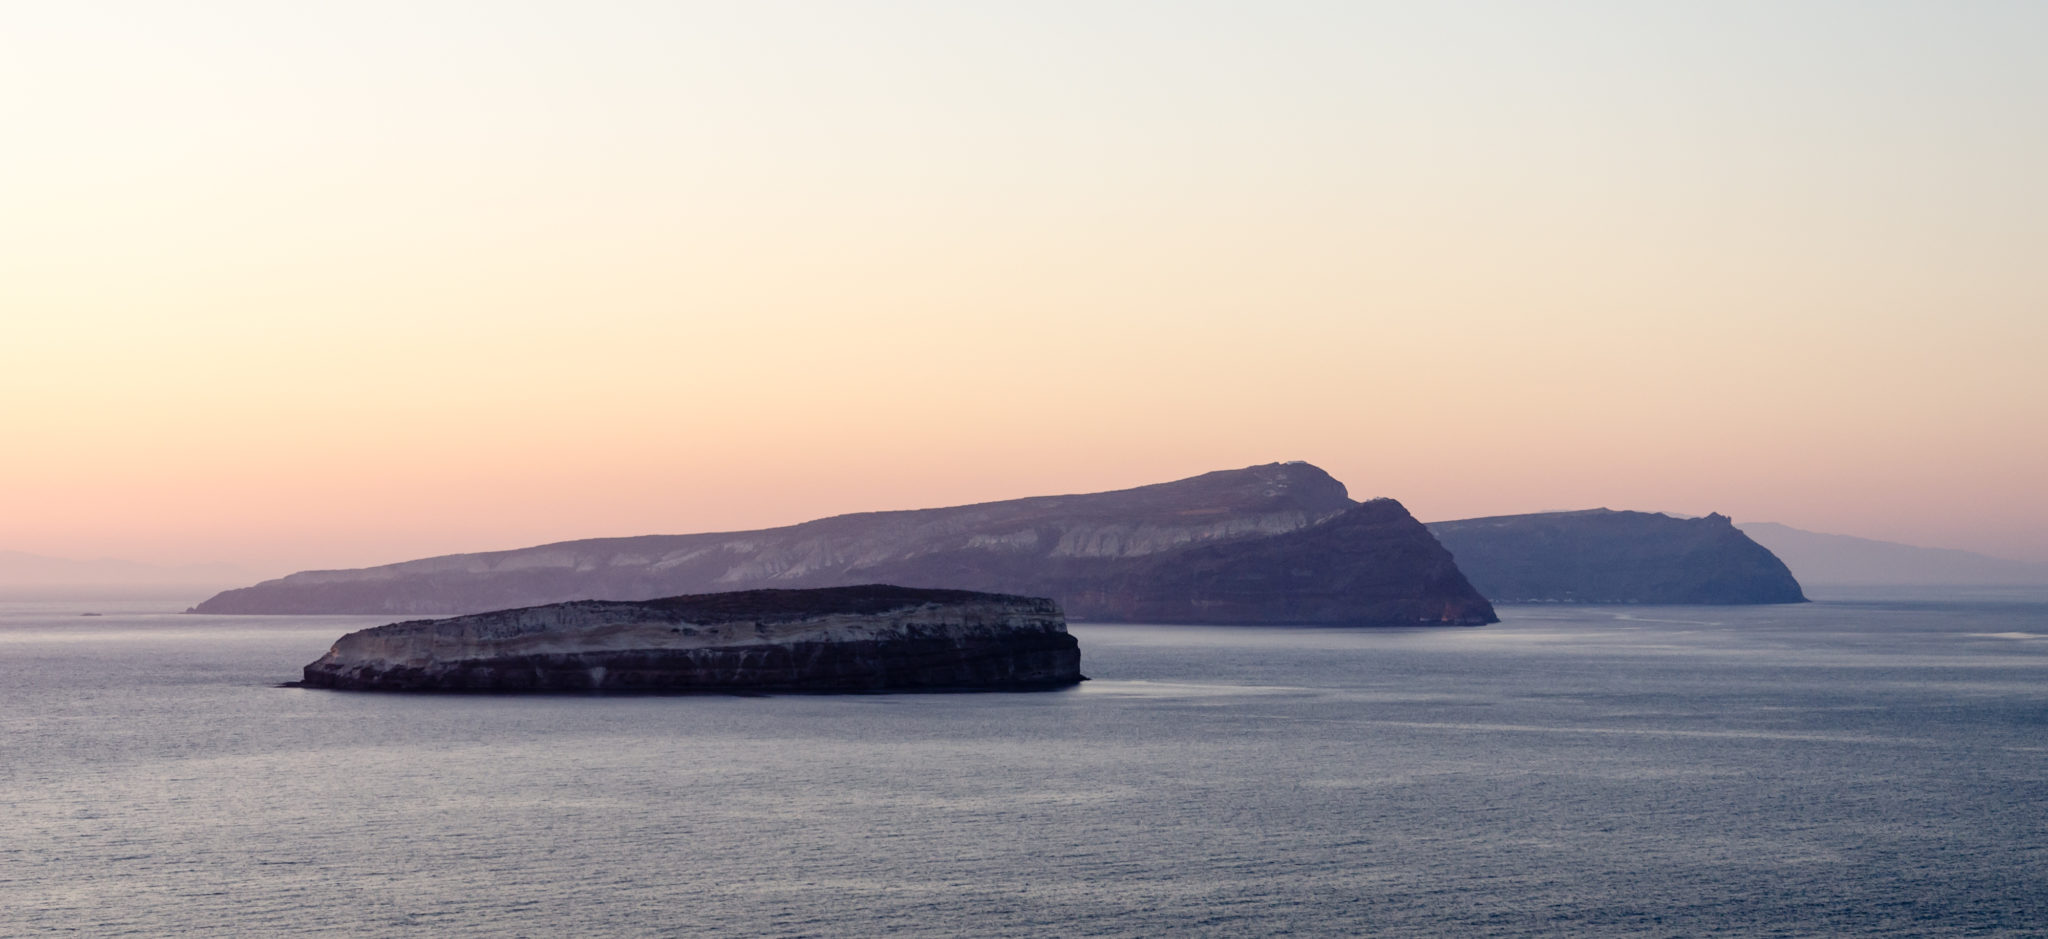 Aspro_-_Nea_Kameni_-_Palea_Kameni_-_Thirasia_-_seen_from_cape_Akrotiri_-_Santorini_-_Greece_-_01